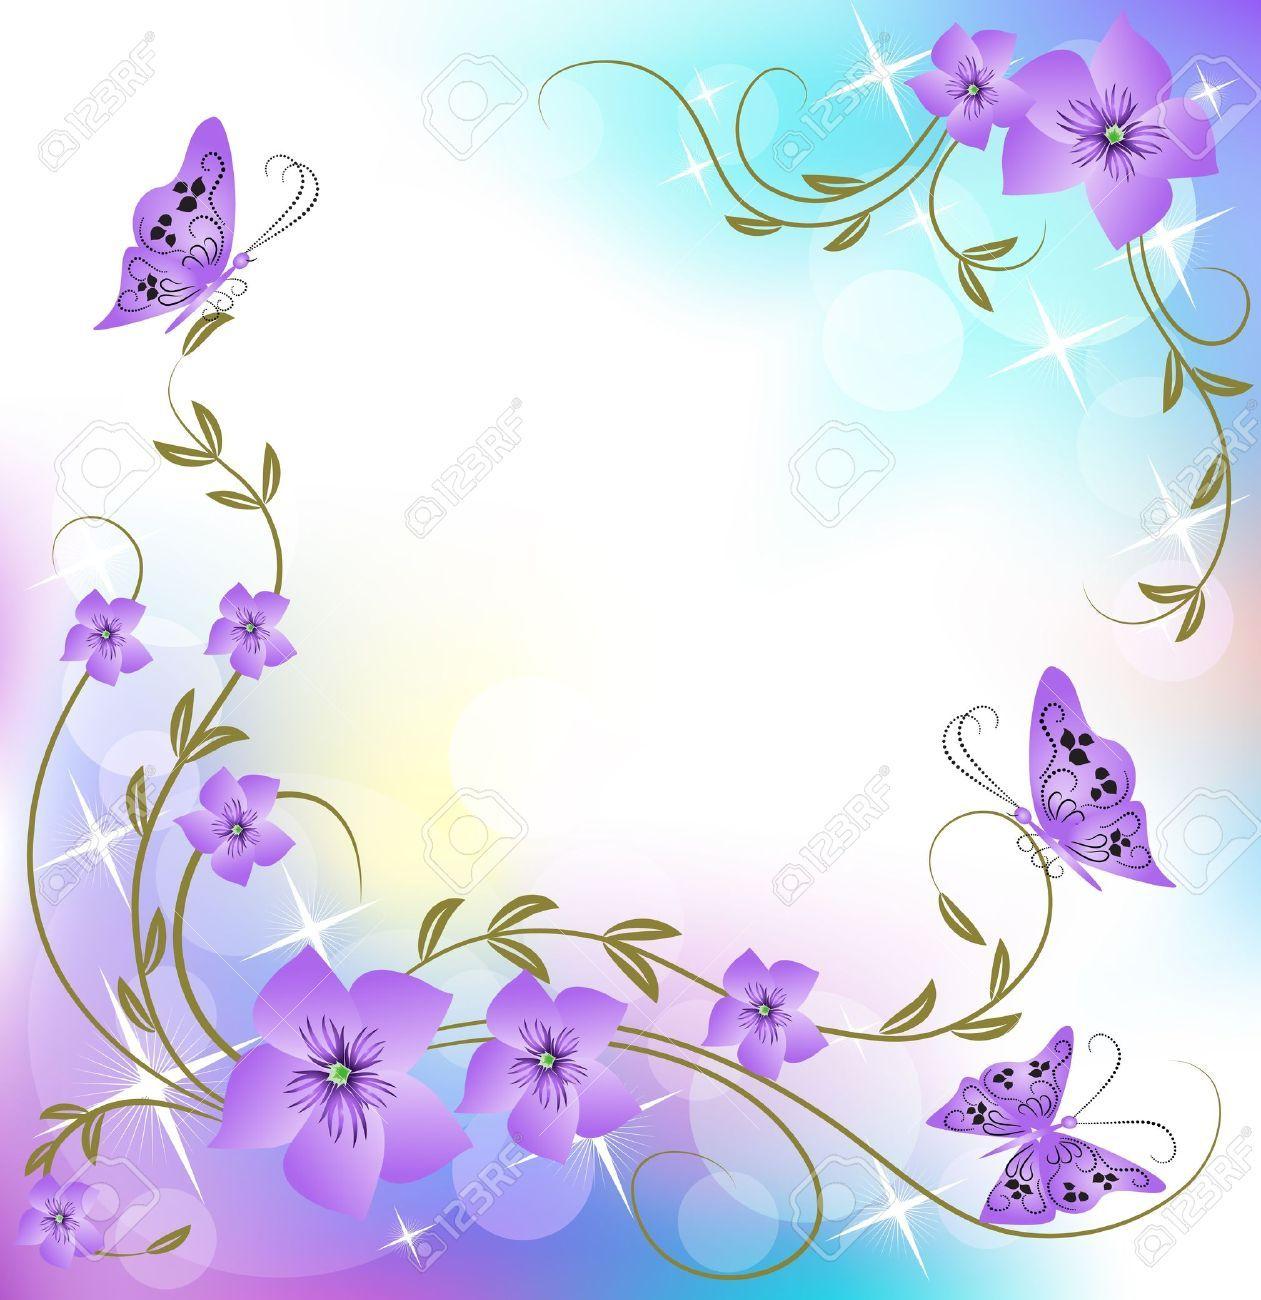 Lavender Background Wedding Wedding Invitation Border Flores Roxas Ideias De Manicure Molduras